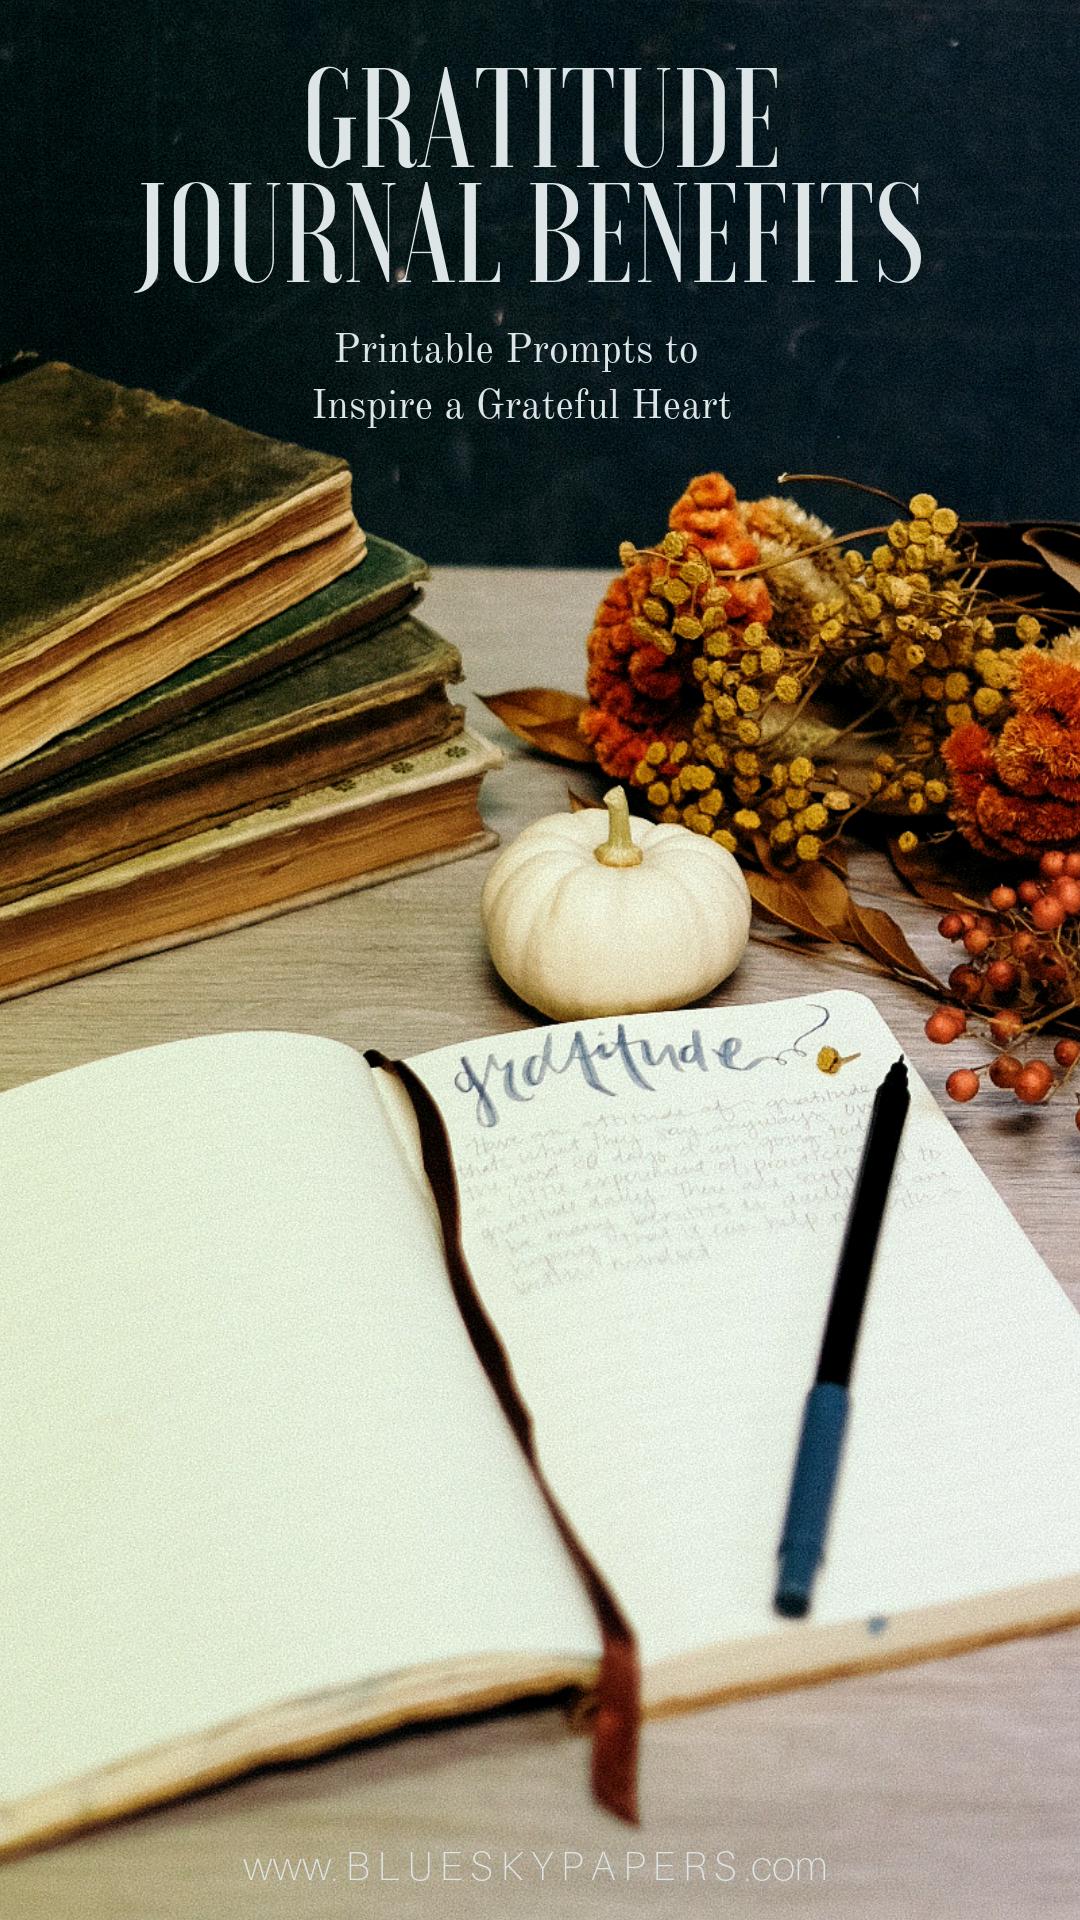 Gratitude-Journal-Benefits_blue-sky-papers